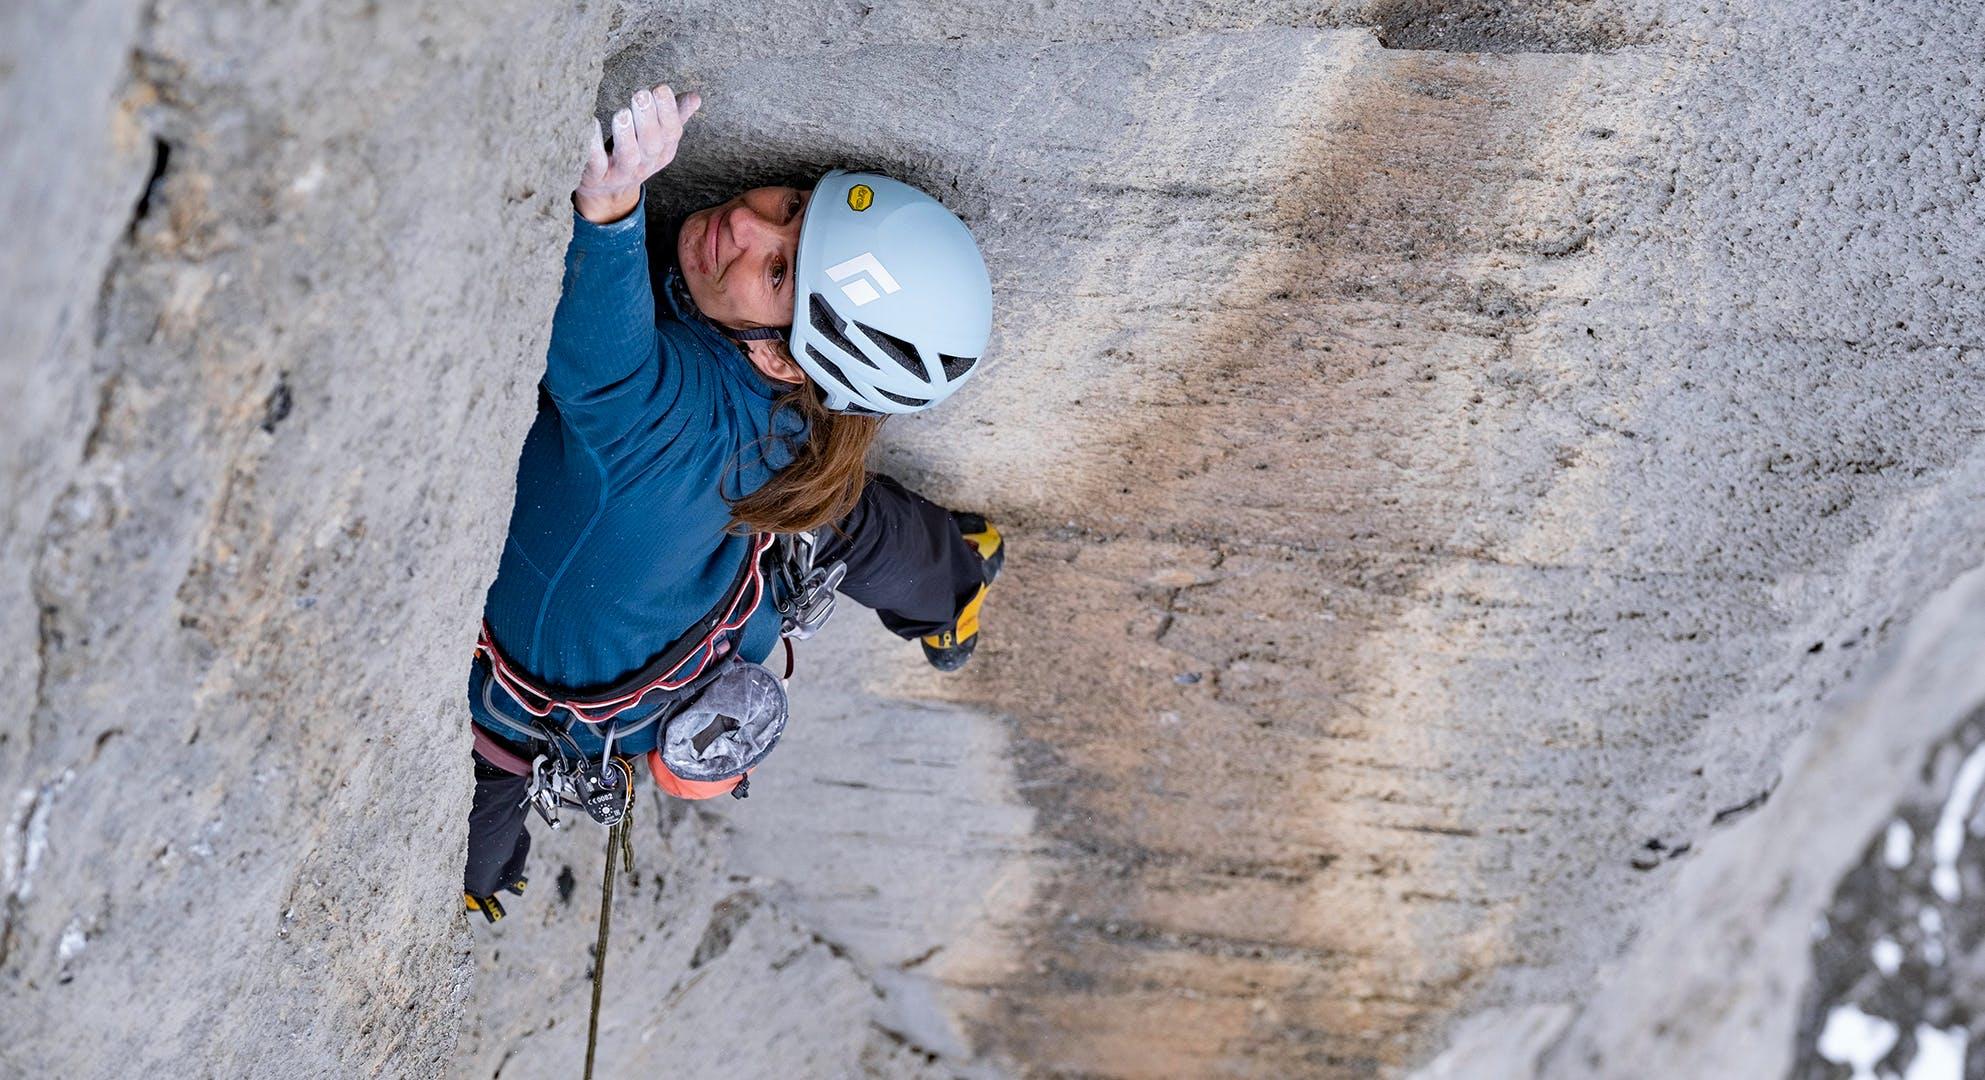 Black Diamond athlete Babsi Zangerl climbing the Eiger